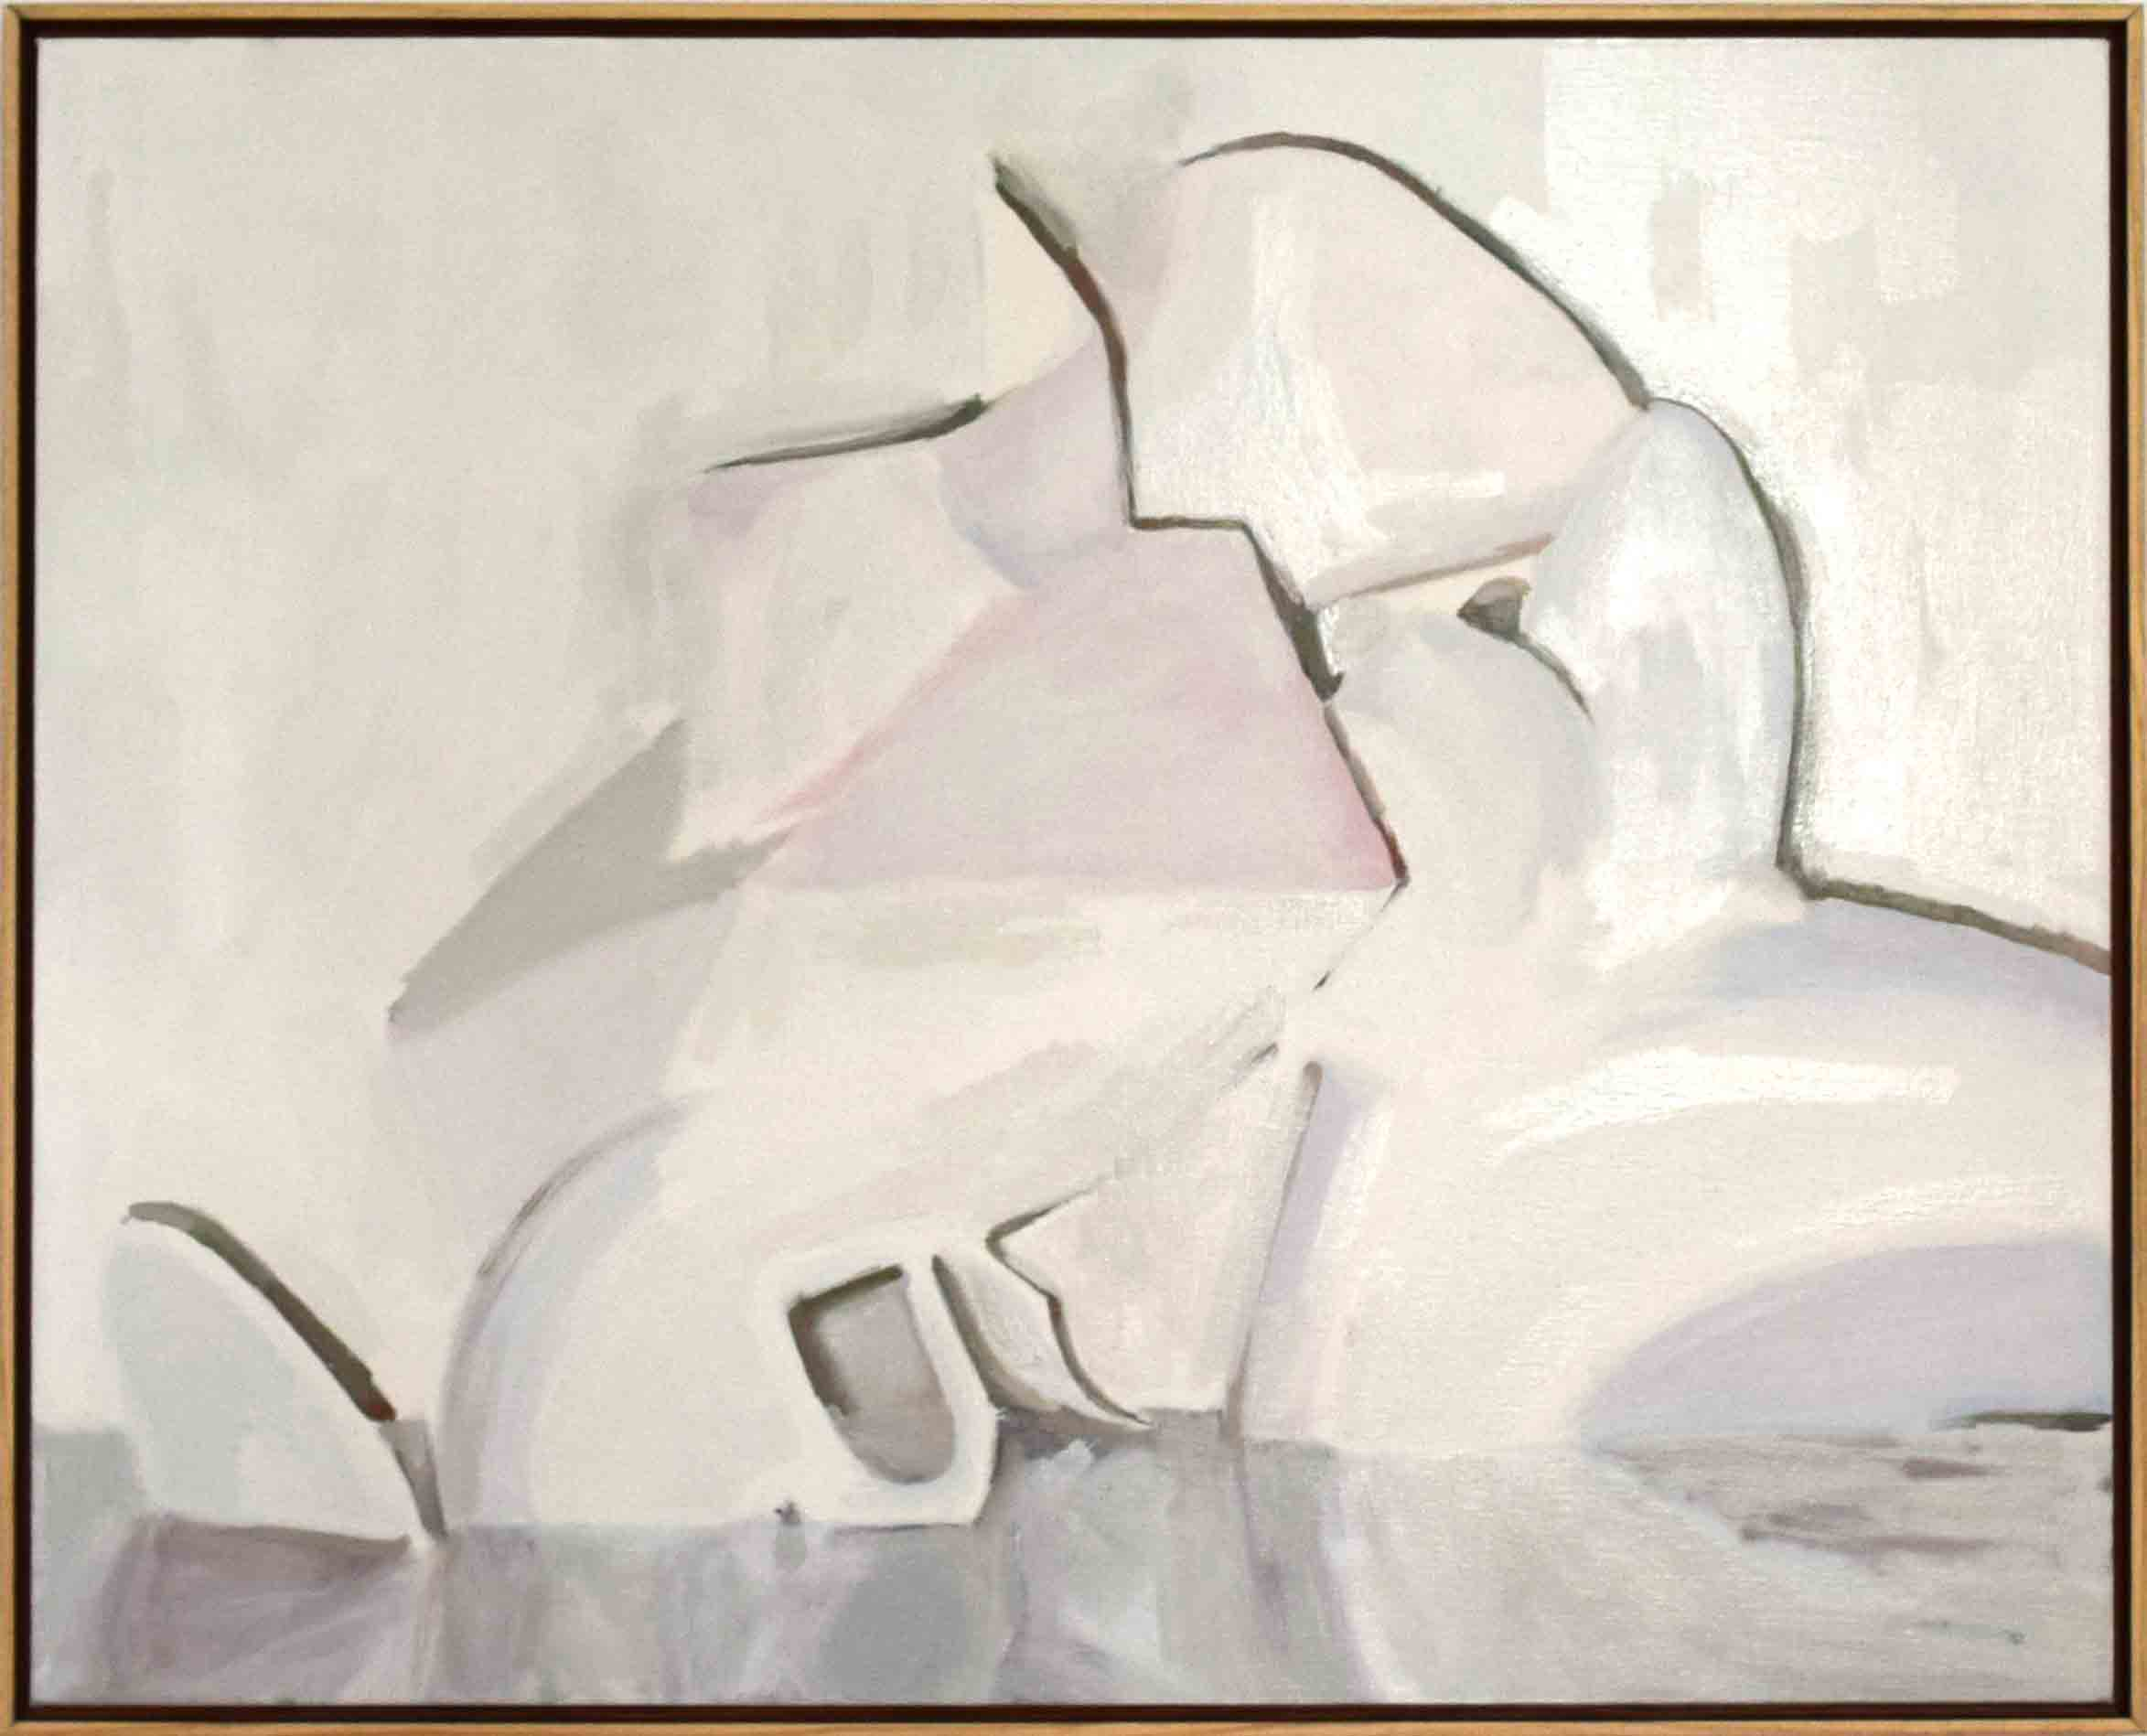 11. Ian Williams,  True Companions,  2018, oil on canvas, 61 x 76 cm $1,290